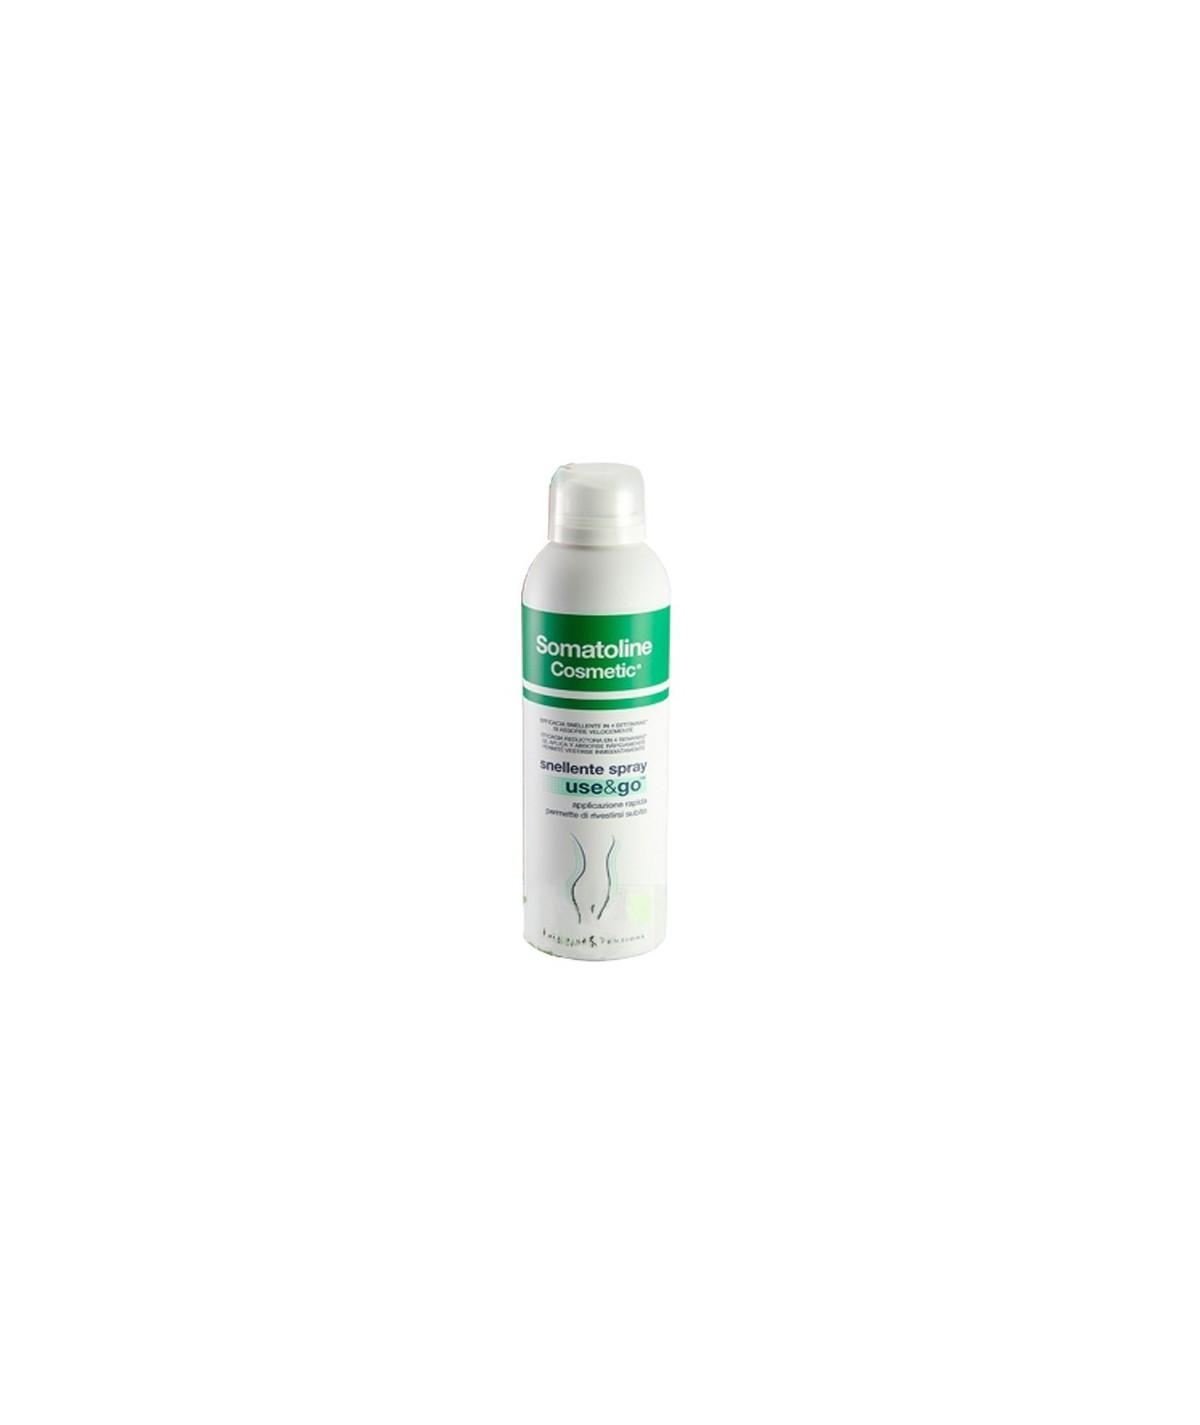 Somatoline Spray Reductor Intensivo Use&Go 200ml